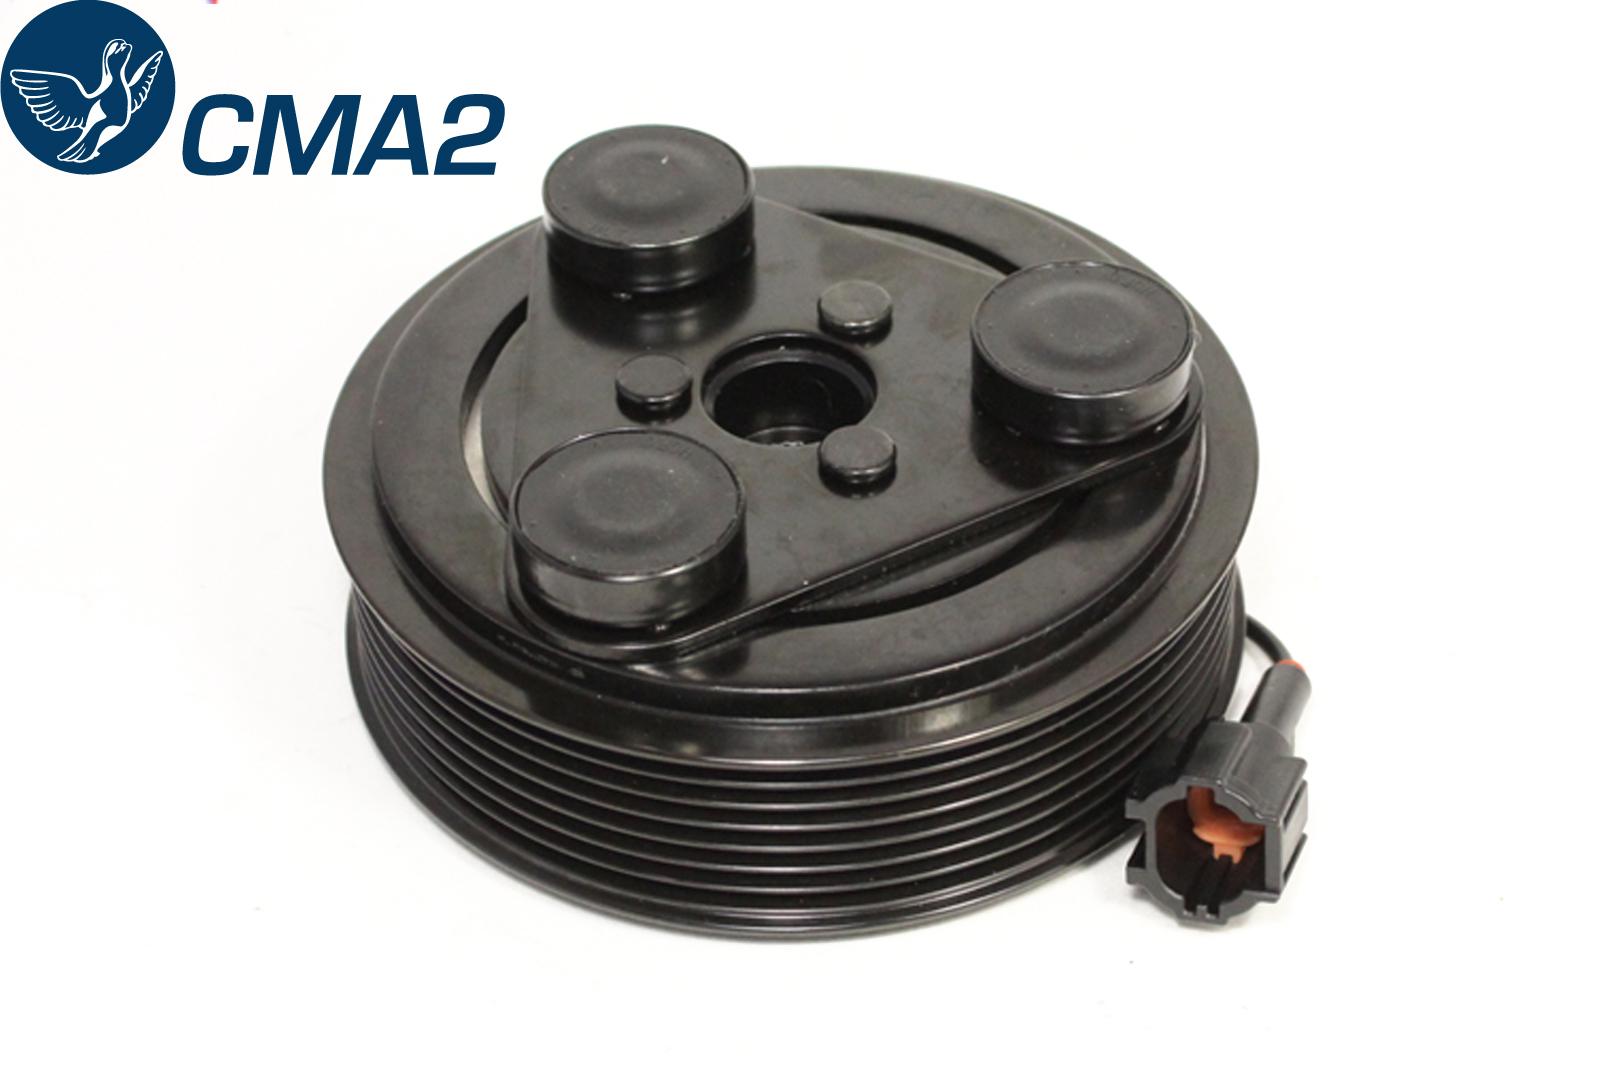 Муфта компрессора кондиционера Ниссан Навара 92660-EB70A 92660EB70A